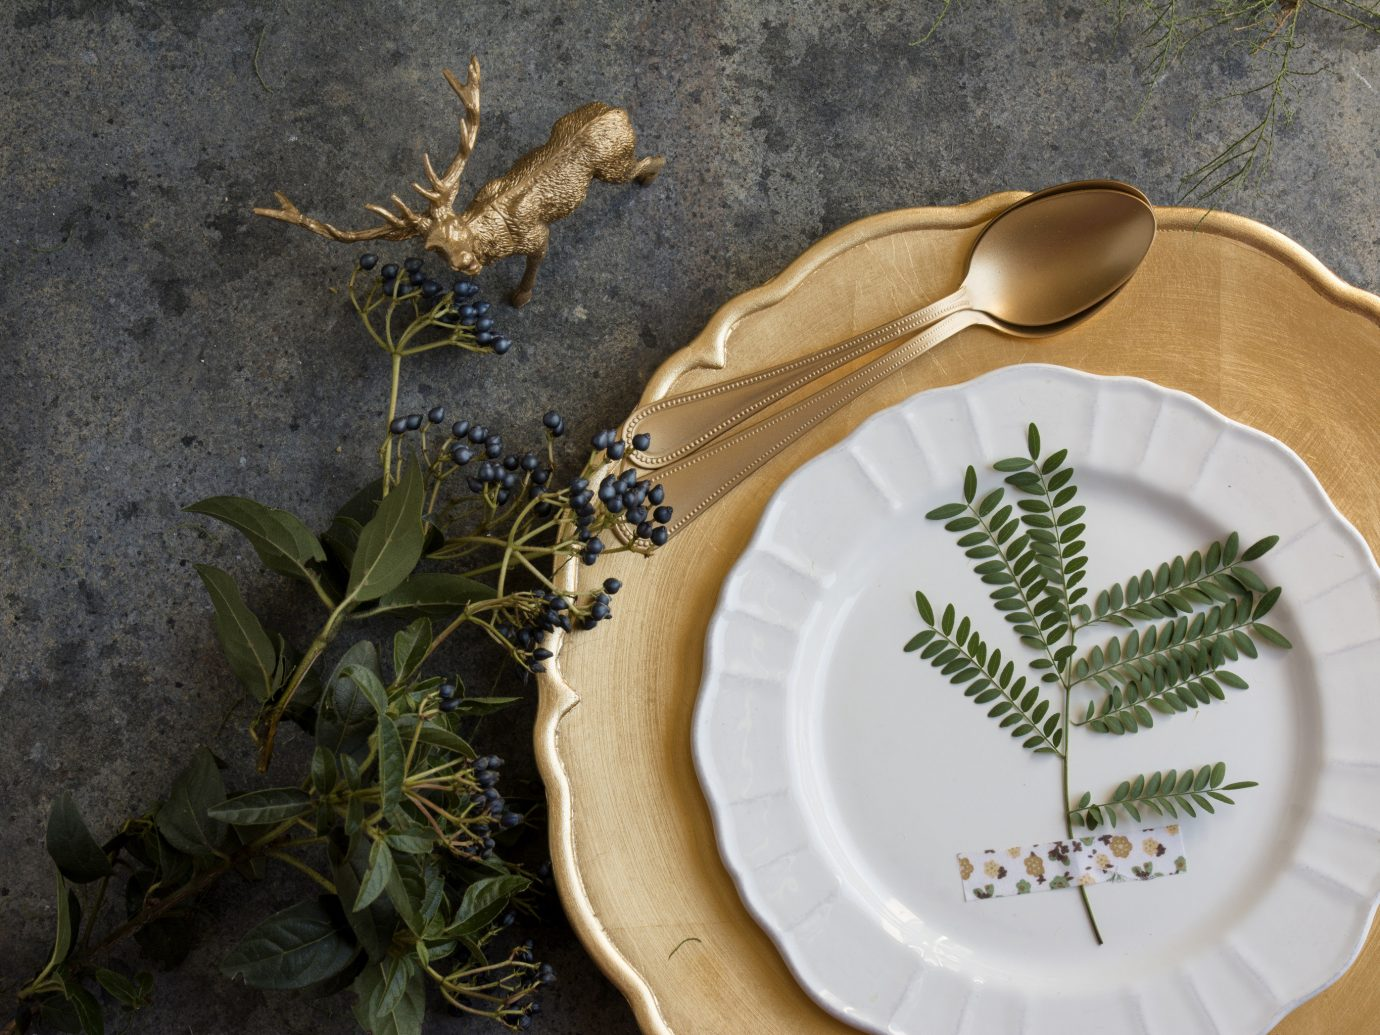 Style + Design plate green flora botany leaf plant art flower herb produce vegetable